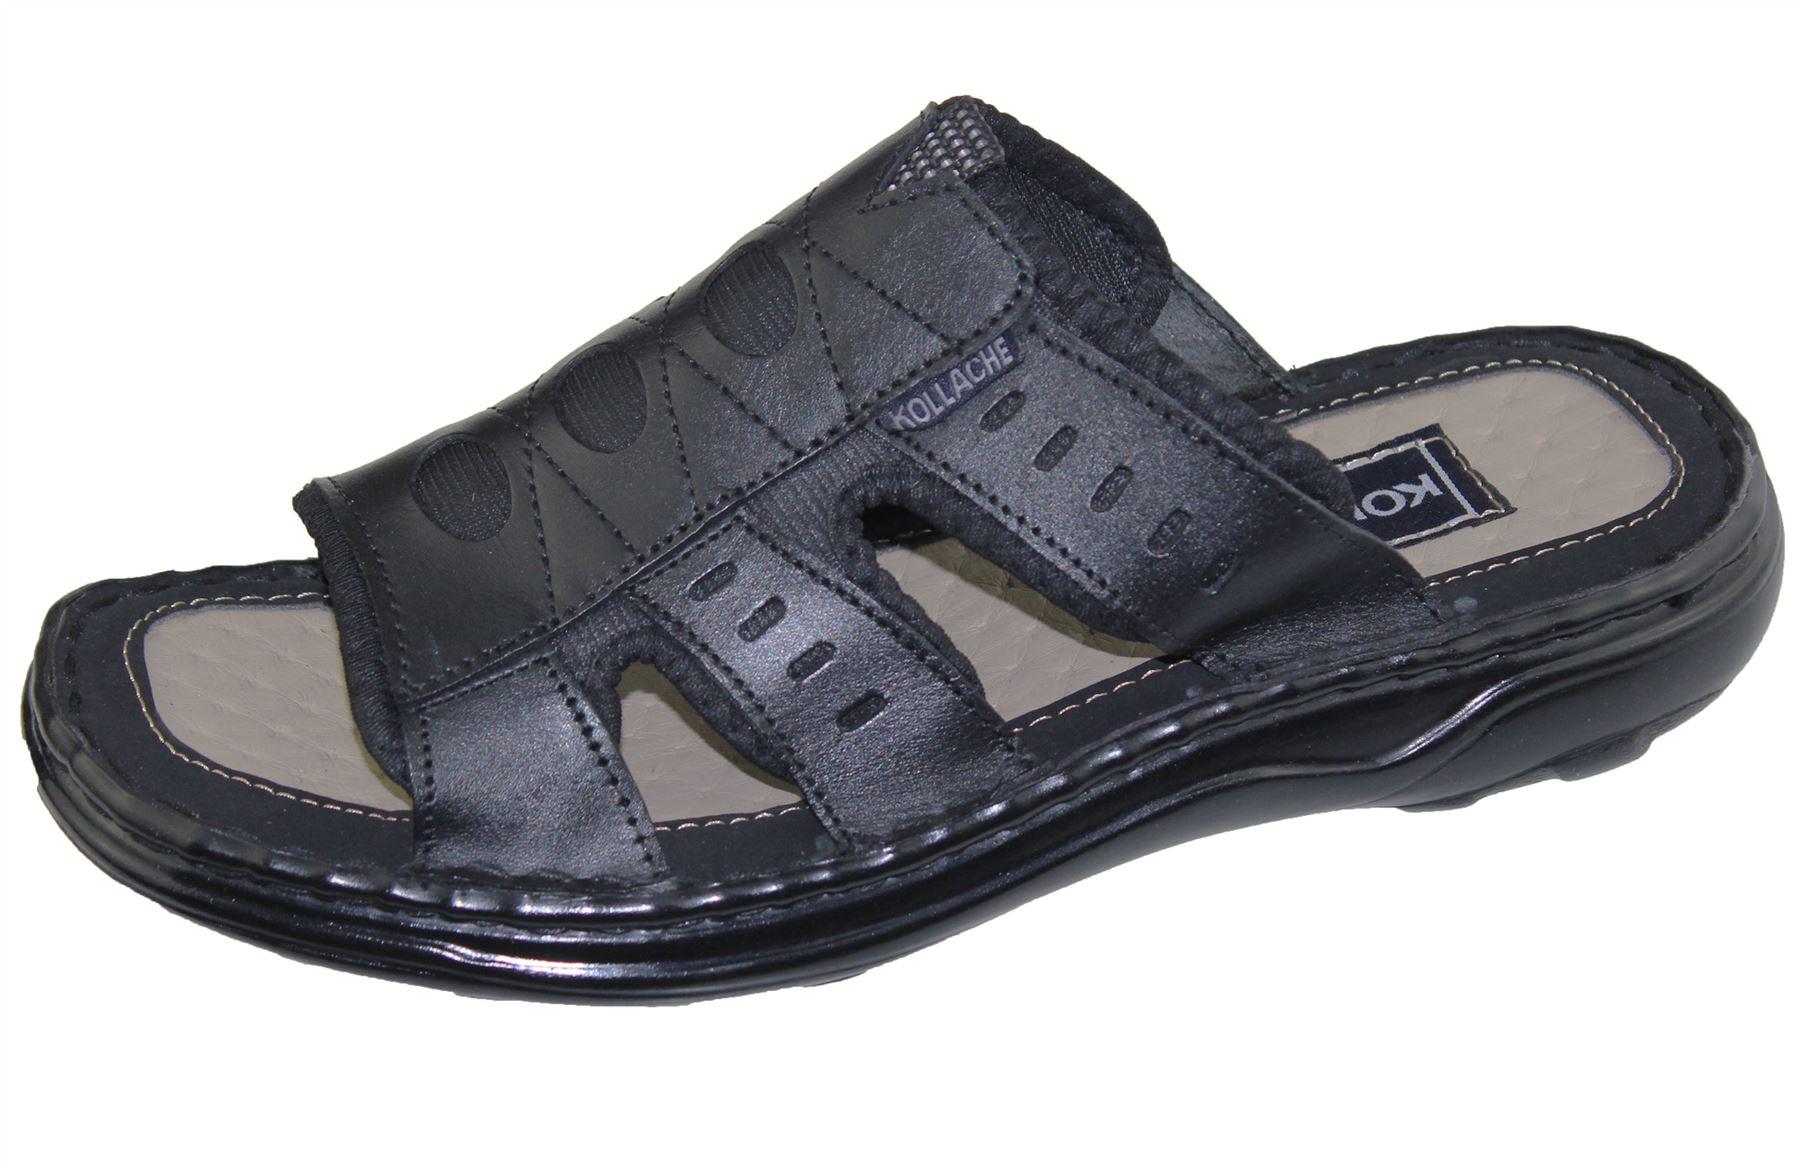 Mens-Slipper-Sandal-Sports-Beach-Buckle-Walking-Fashion-Summer-Casual-Shoes-Size miniatura 12